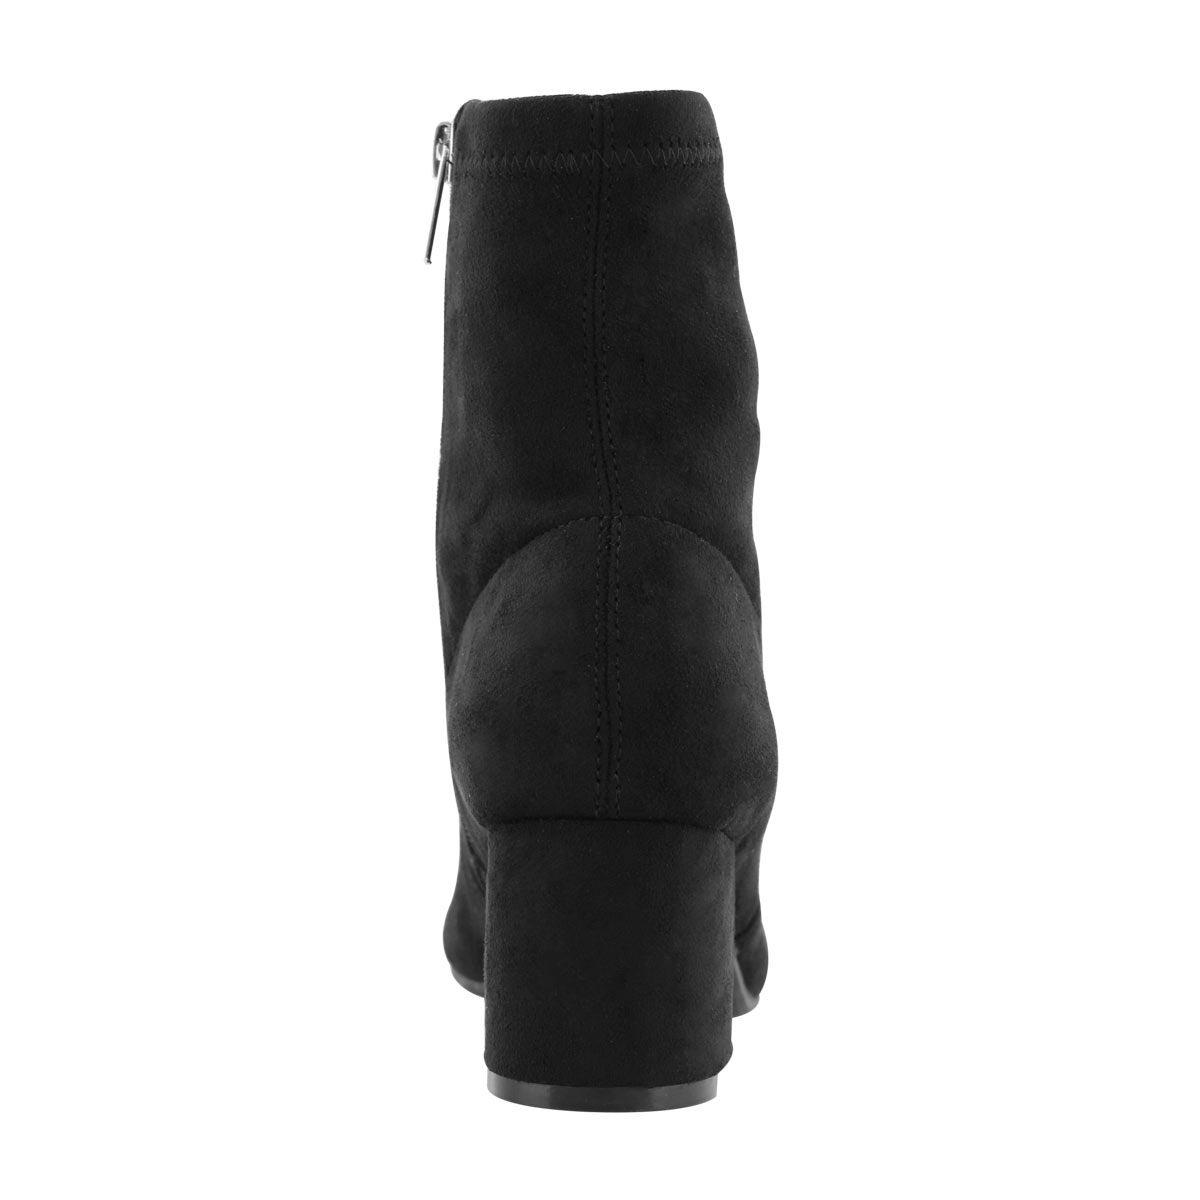 Bottines habillées Irven, noir, femmes